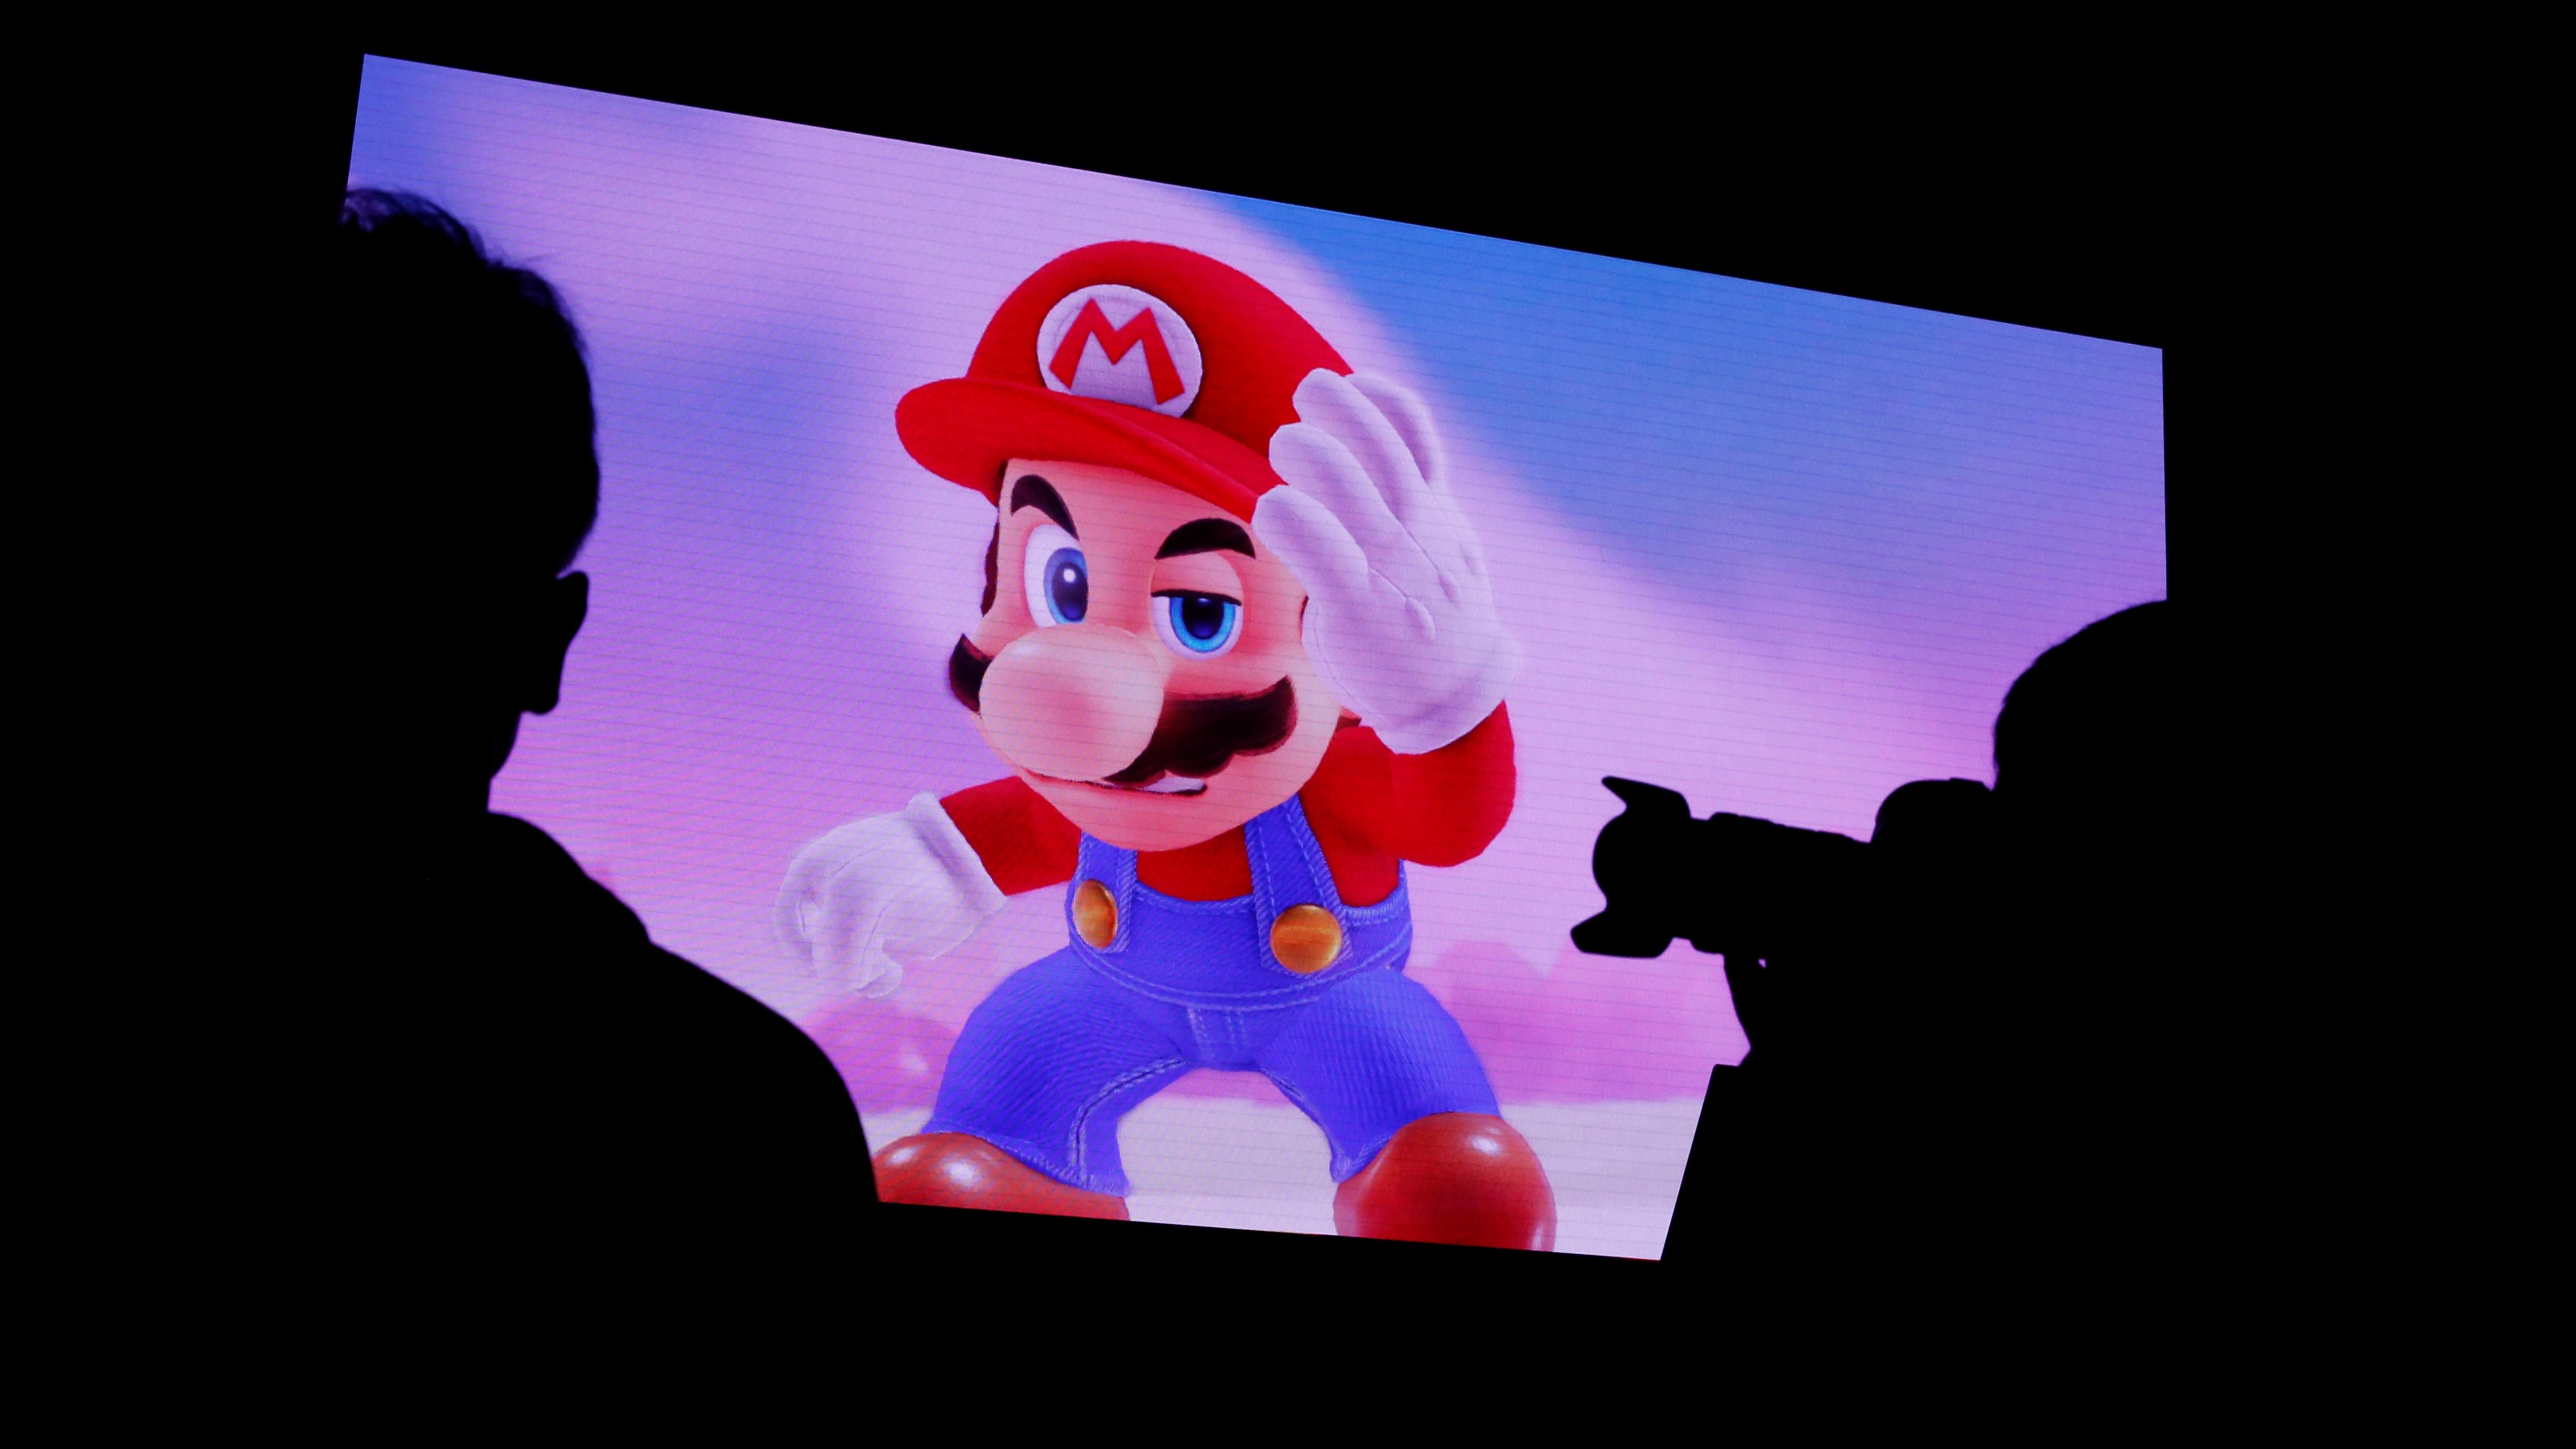 Nintendo might have sold an emulator version of Super Mario